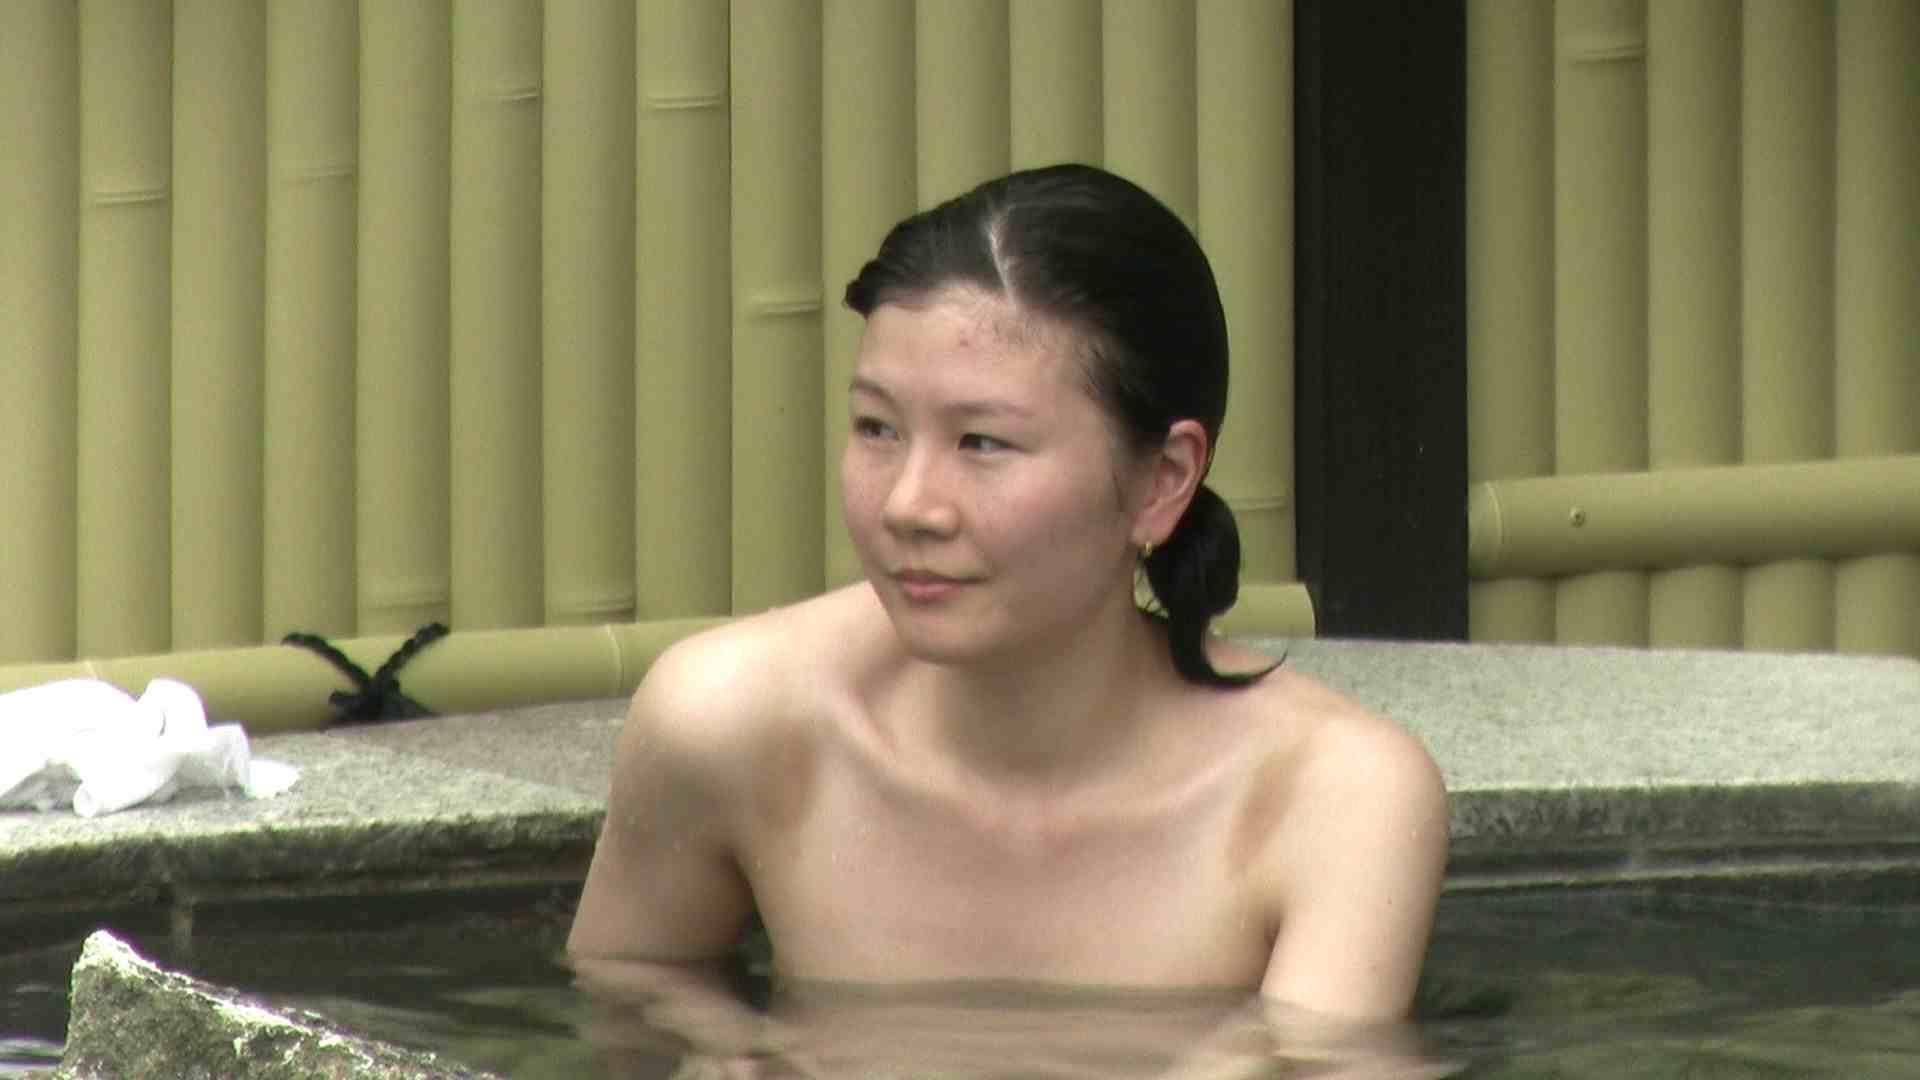 Aquaな露天風呂Vol.187 盗撮映像  99Pix 47